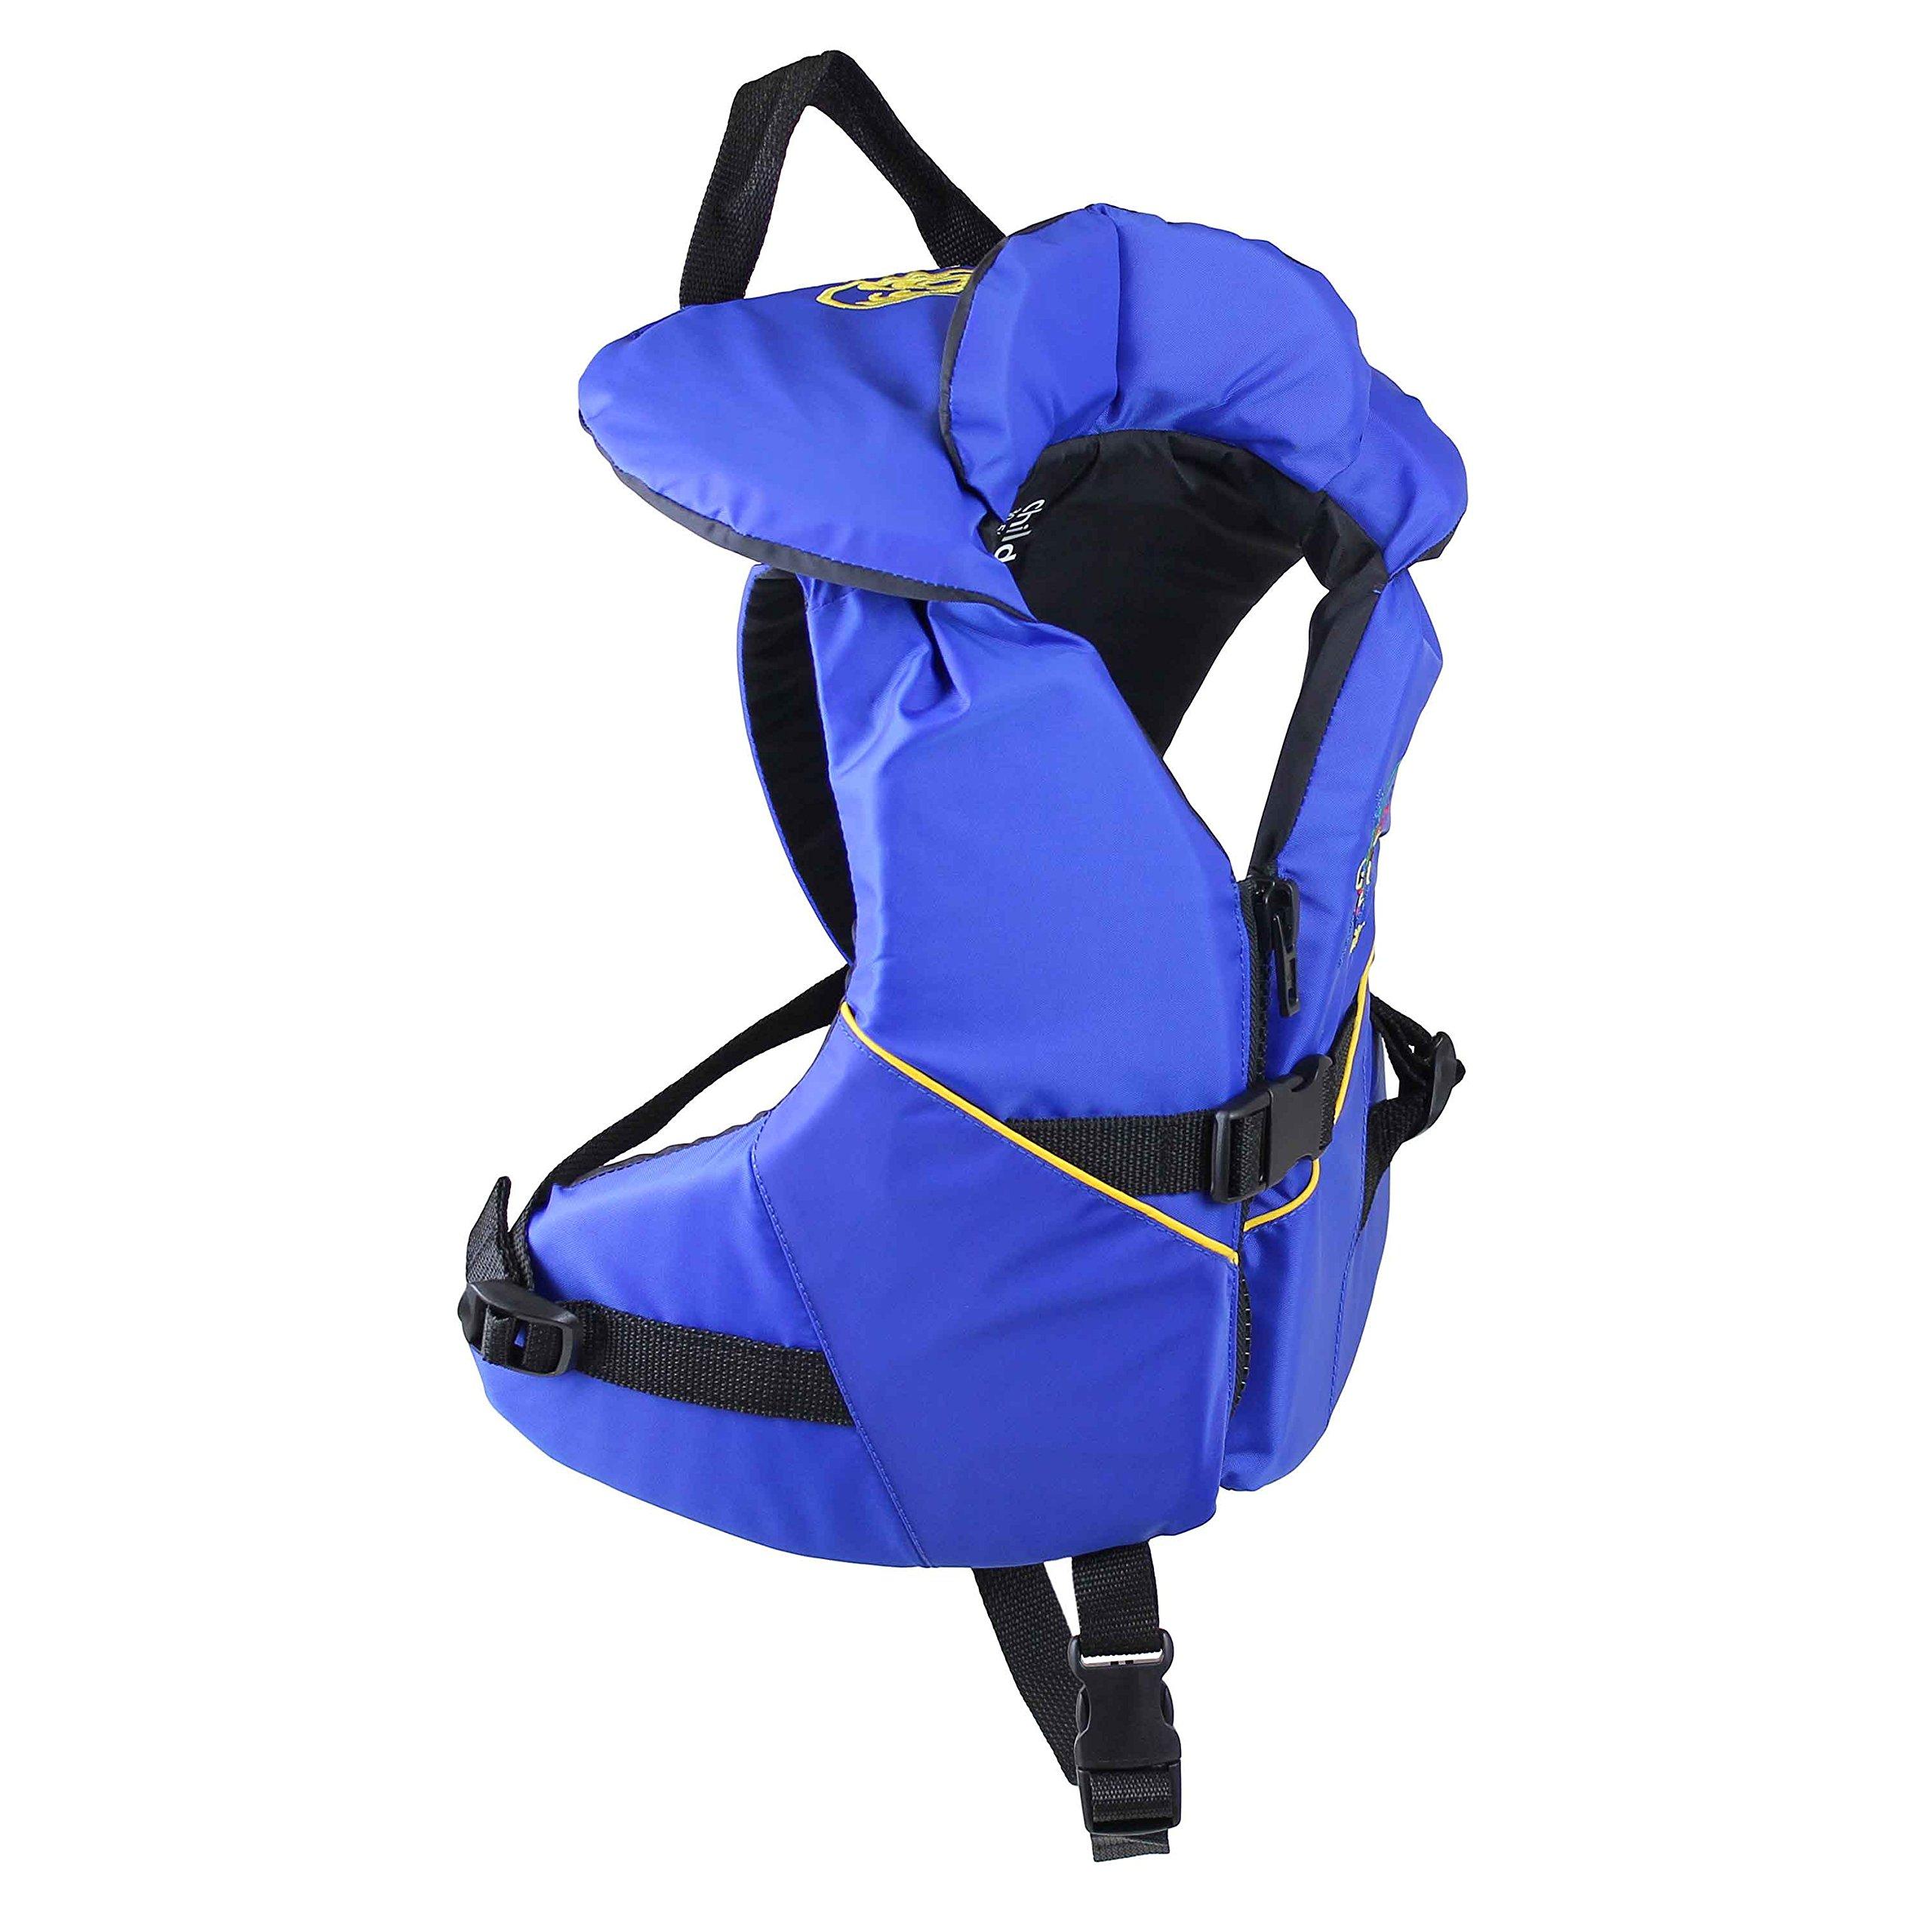 Stohlquist Child PFD 30-50 lbs, Blue/Black